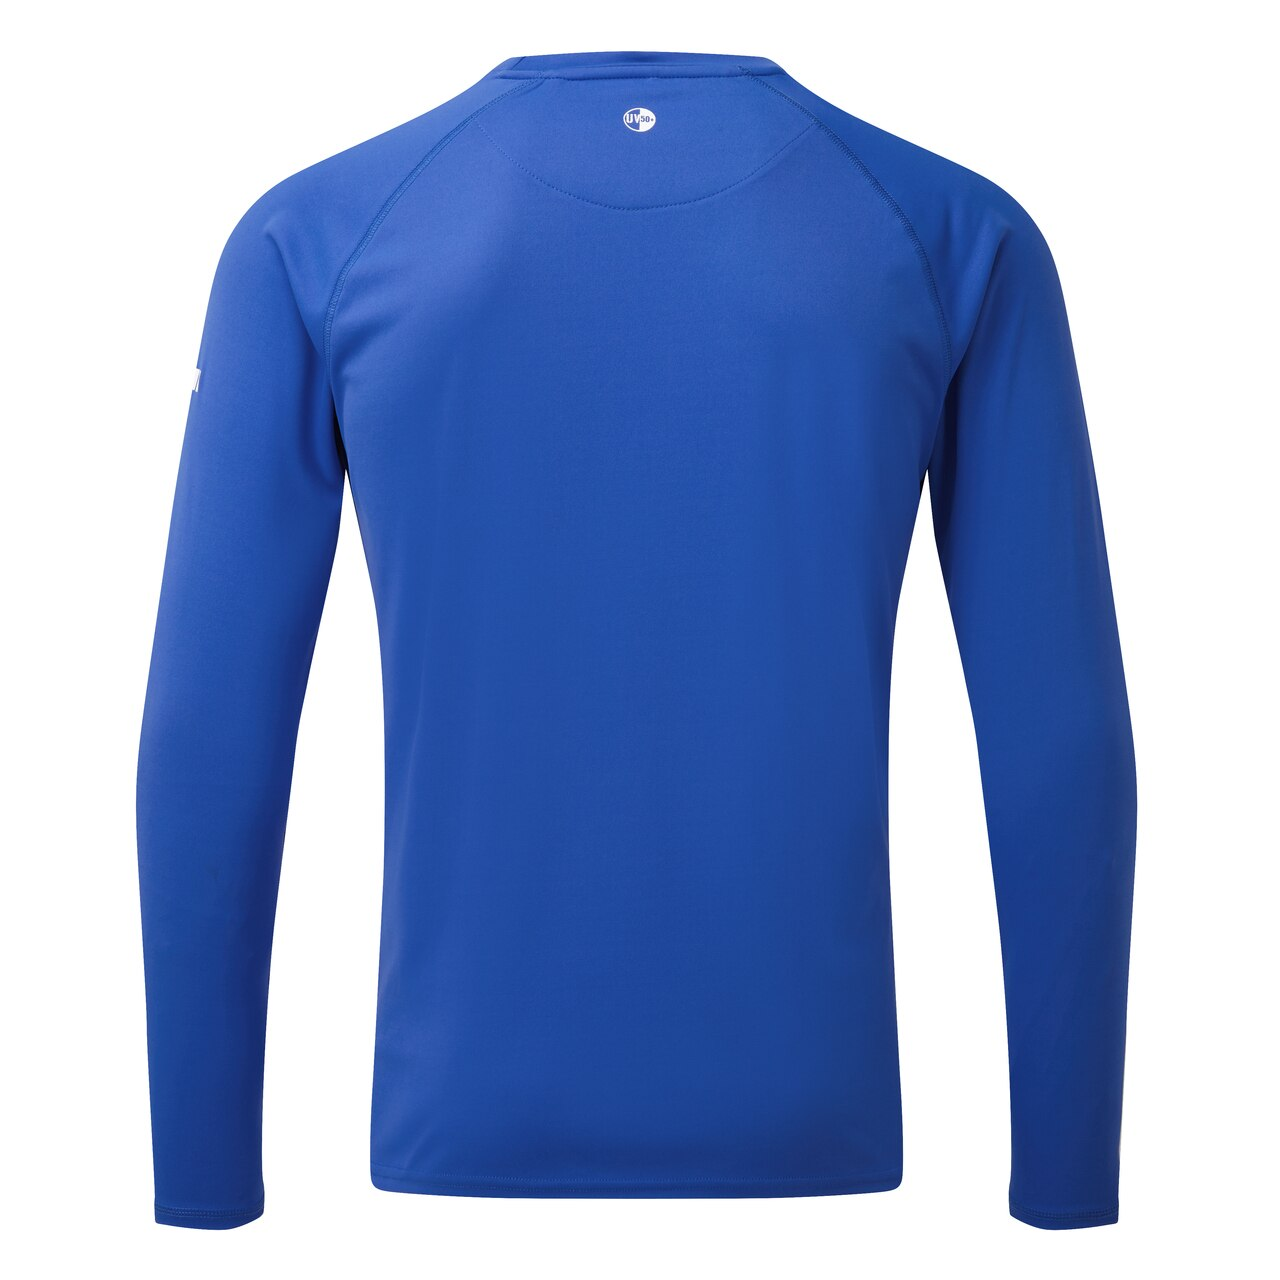 Men's UV Tec Long Sleeve Tee - UV011-BLU01-3.jpg